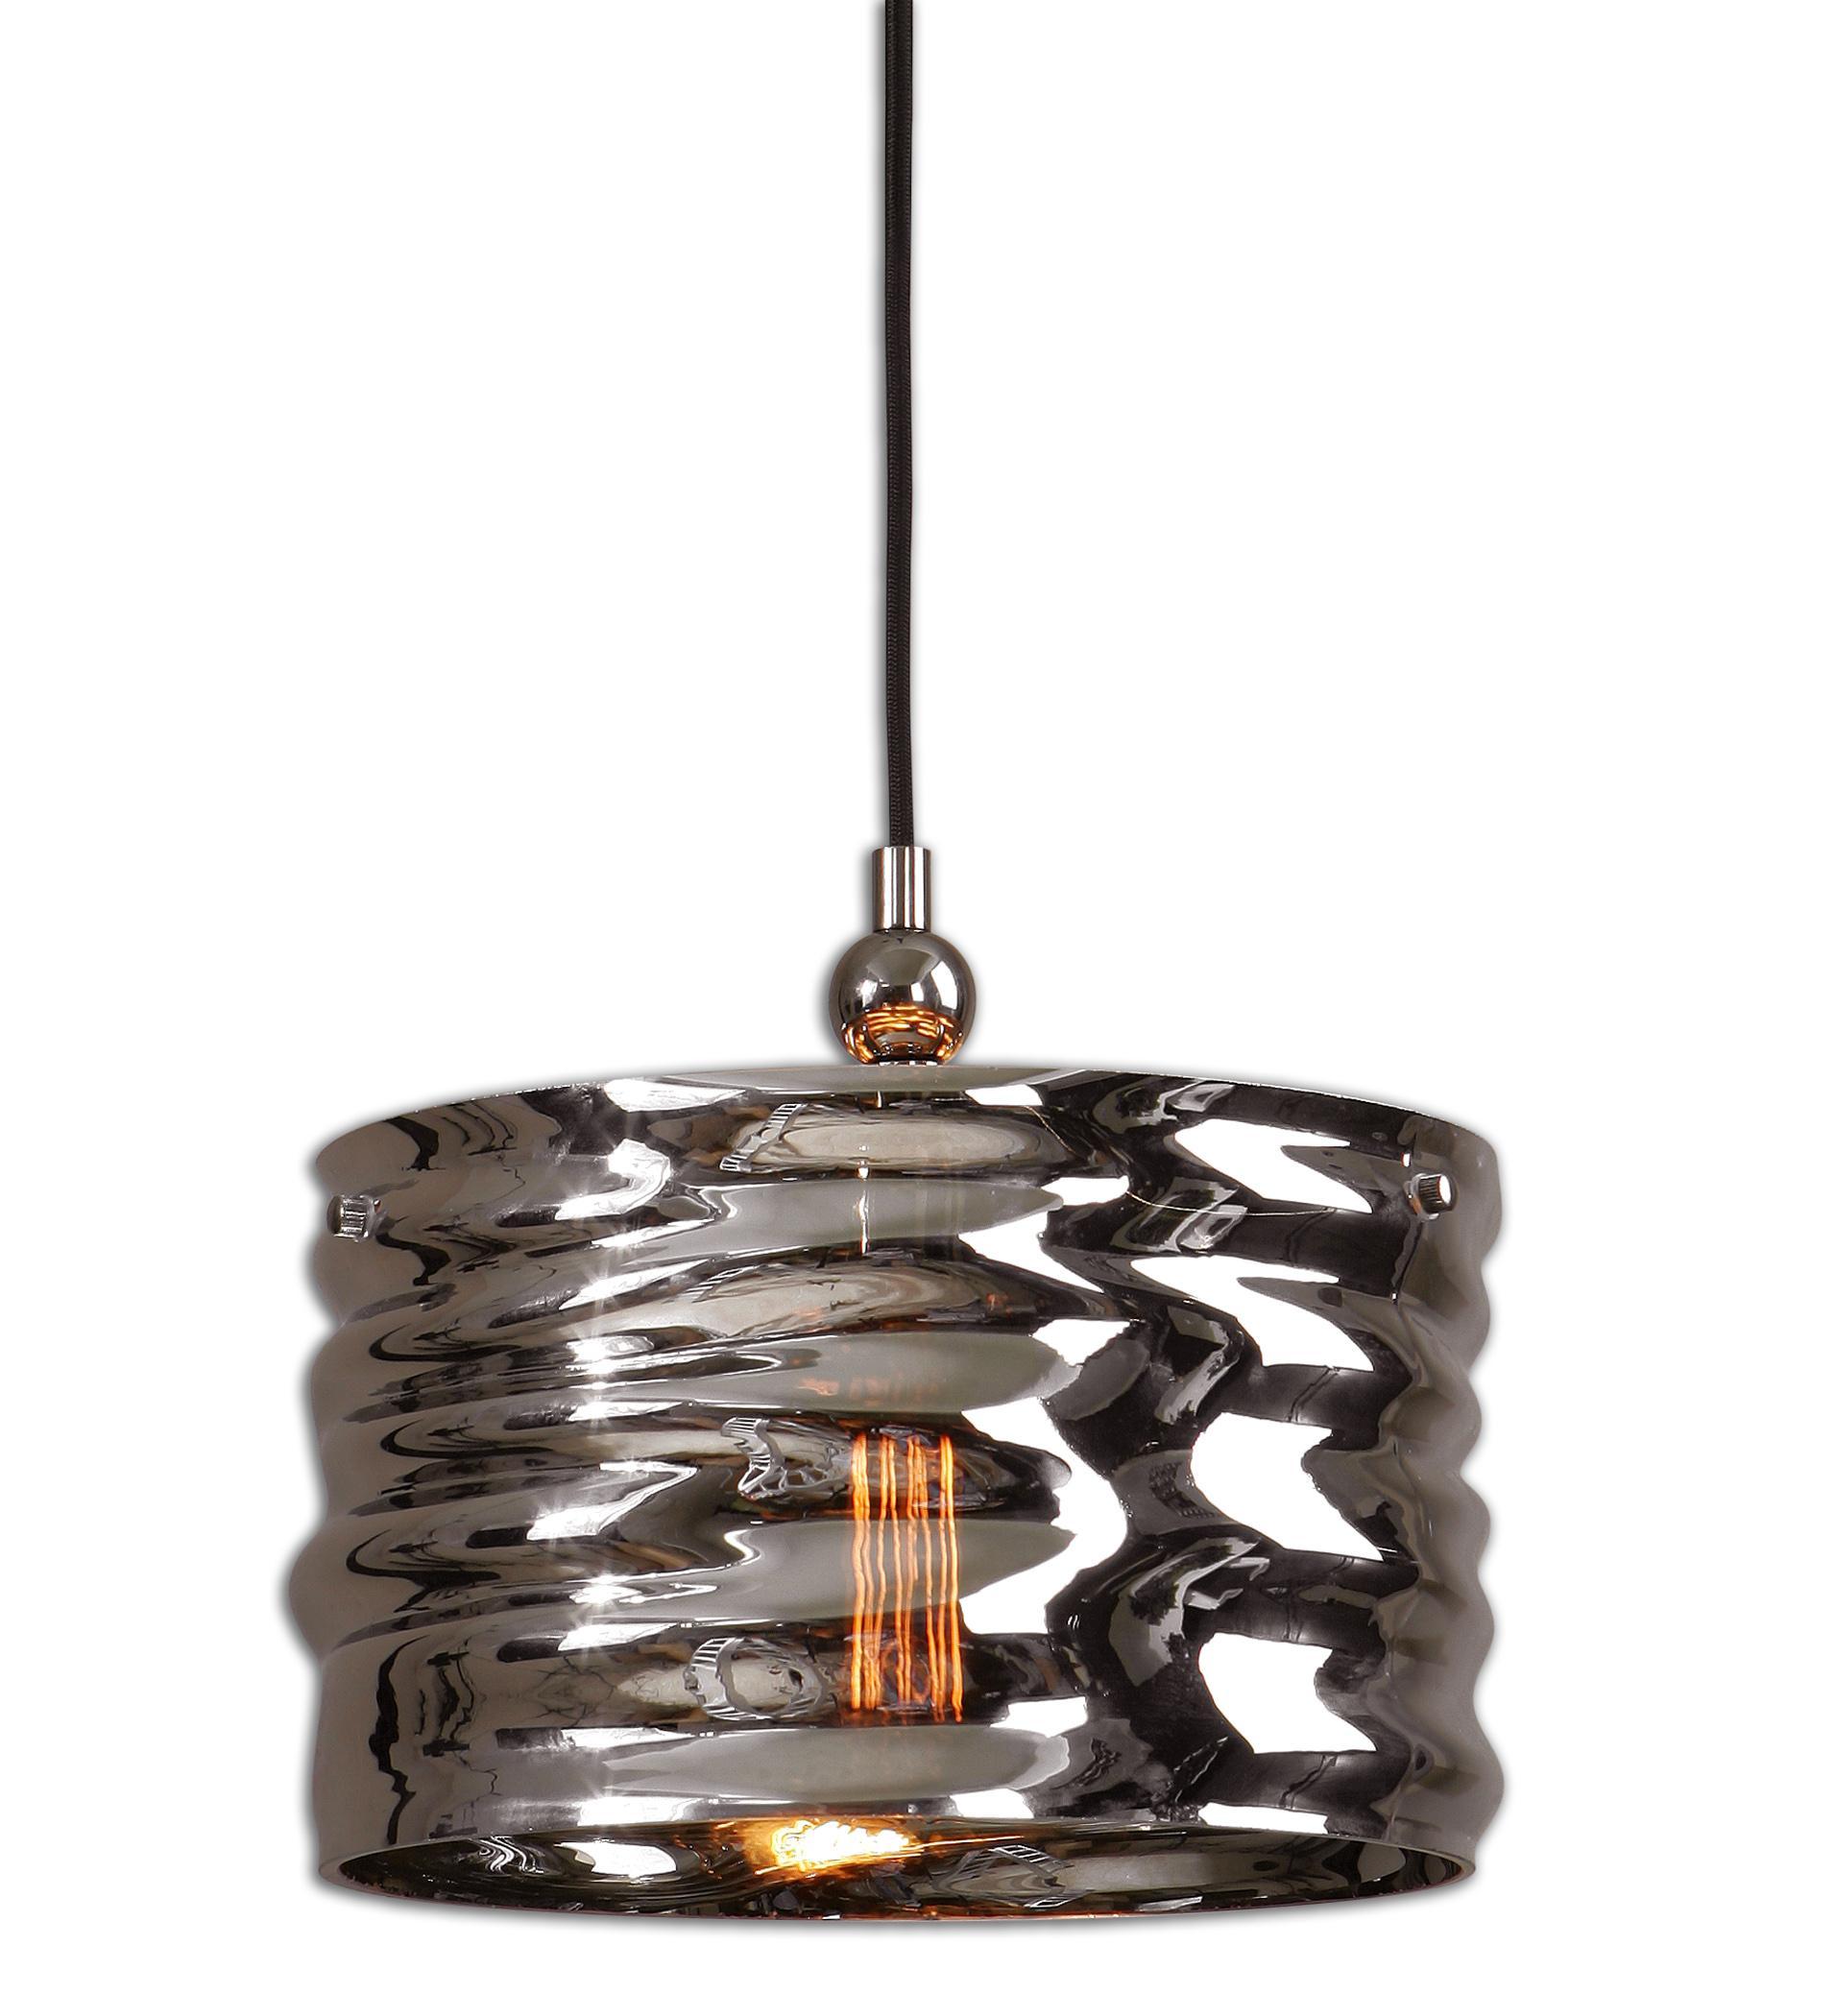 Uttermost Lighting Fixtures Aragon 1 Light Nickel Glass Pendant - Item Number: 22011